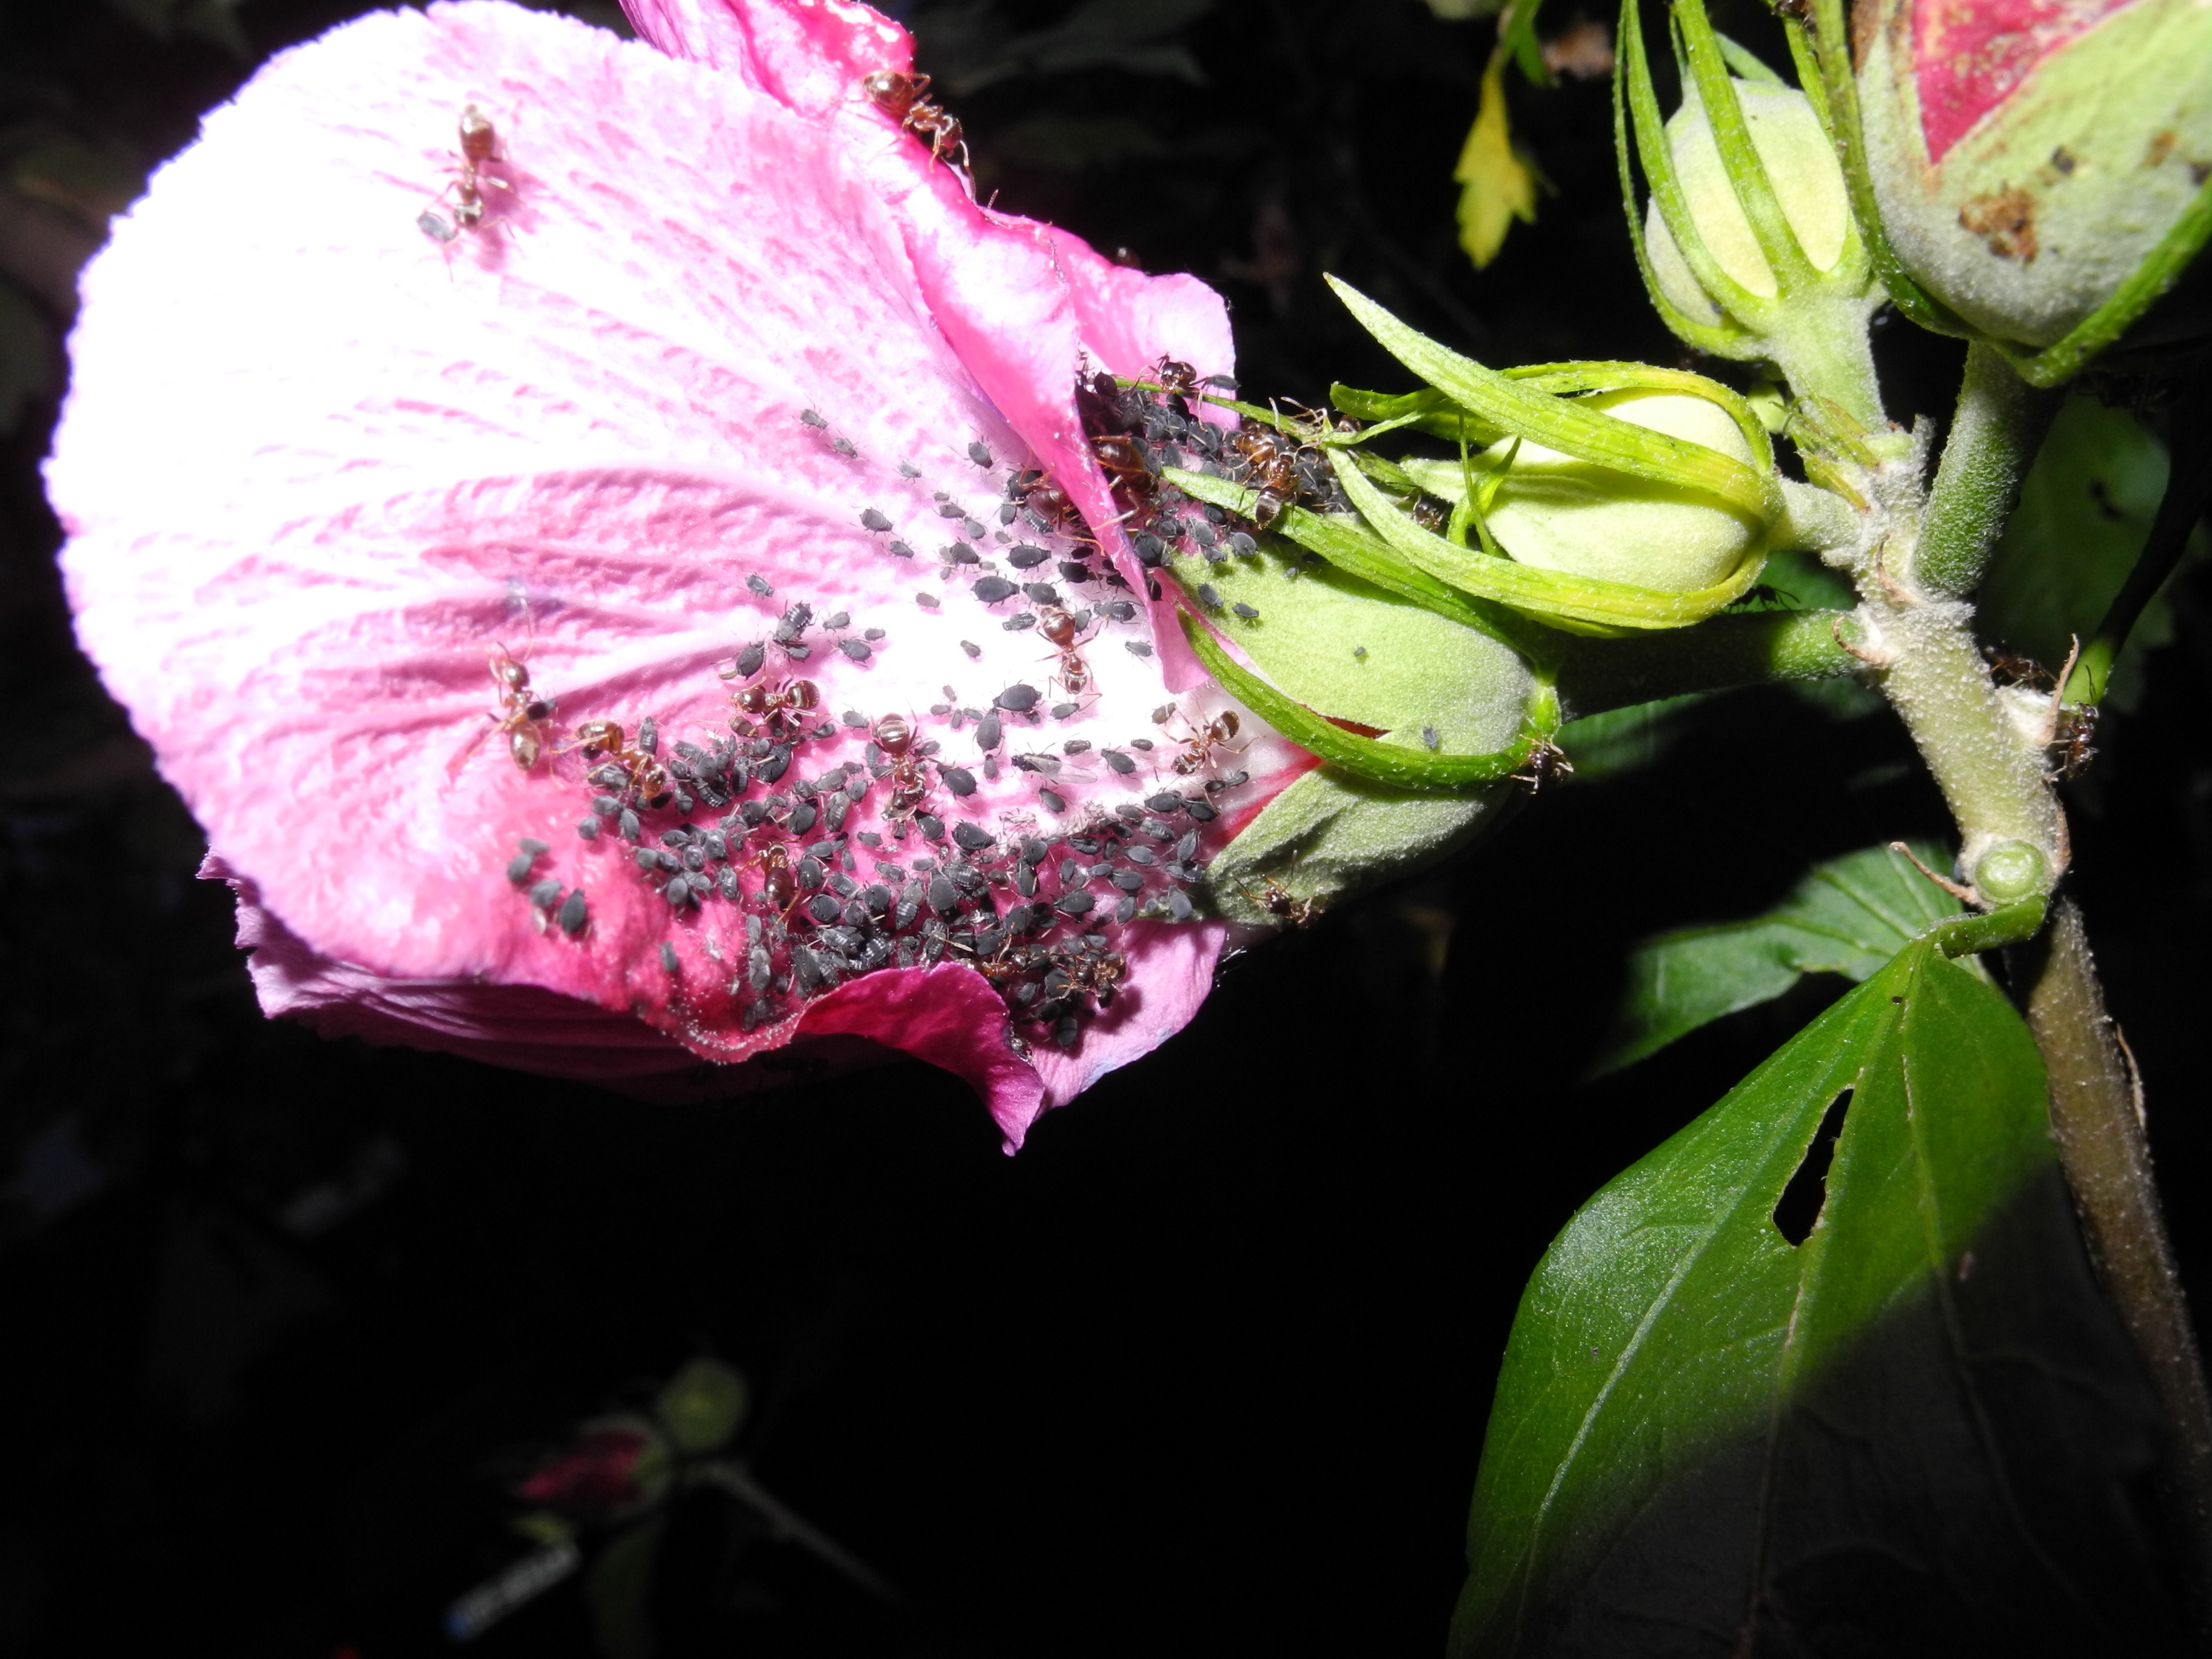 Macro Photo Rose And Lice Diy